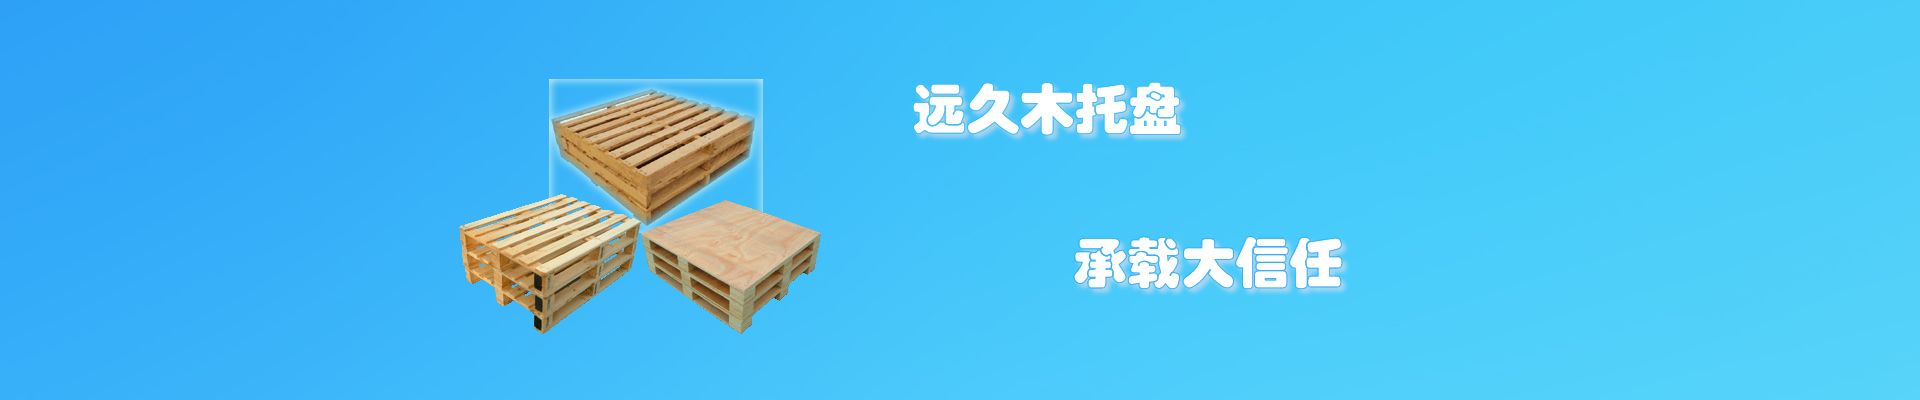 sbf123胜博发娱乐,胜博发娱乐注册登录,胜博发娱乐手机客户端_远久木托盘